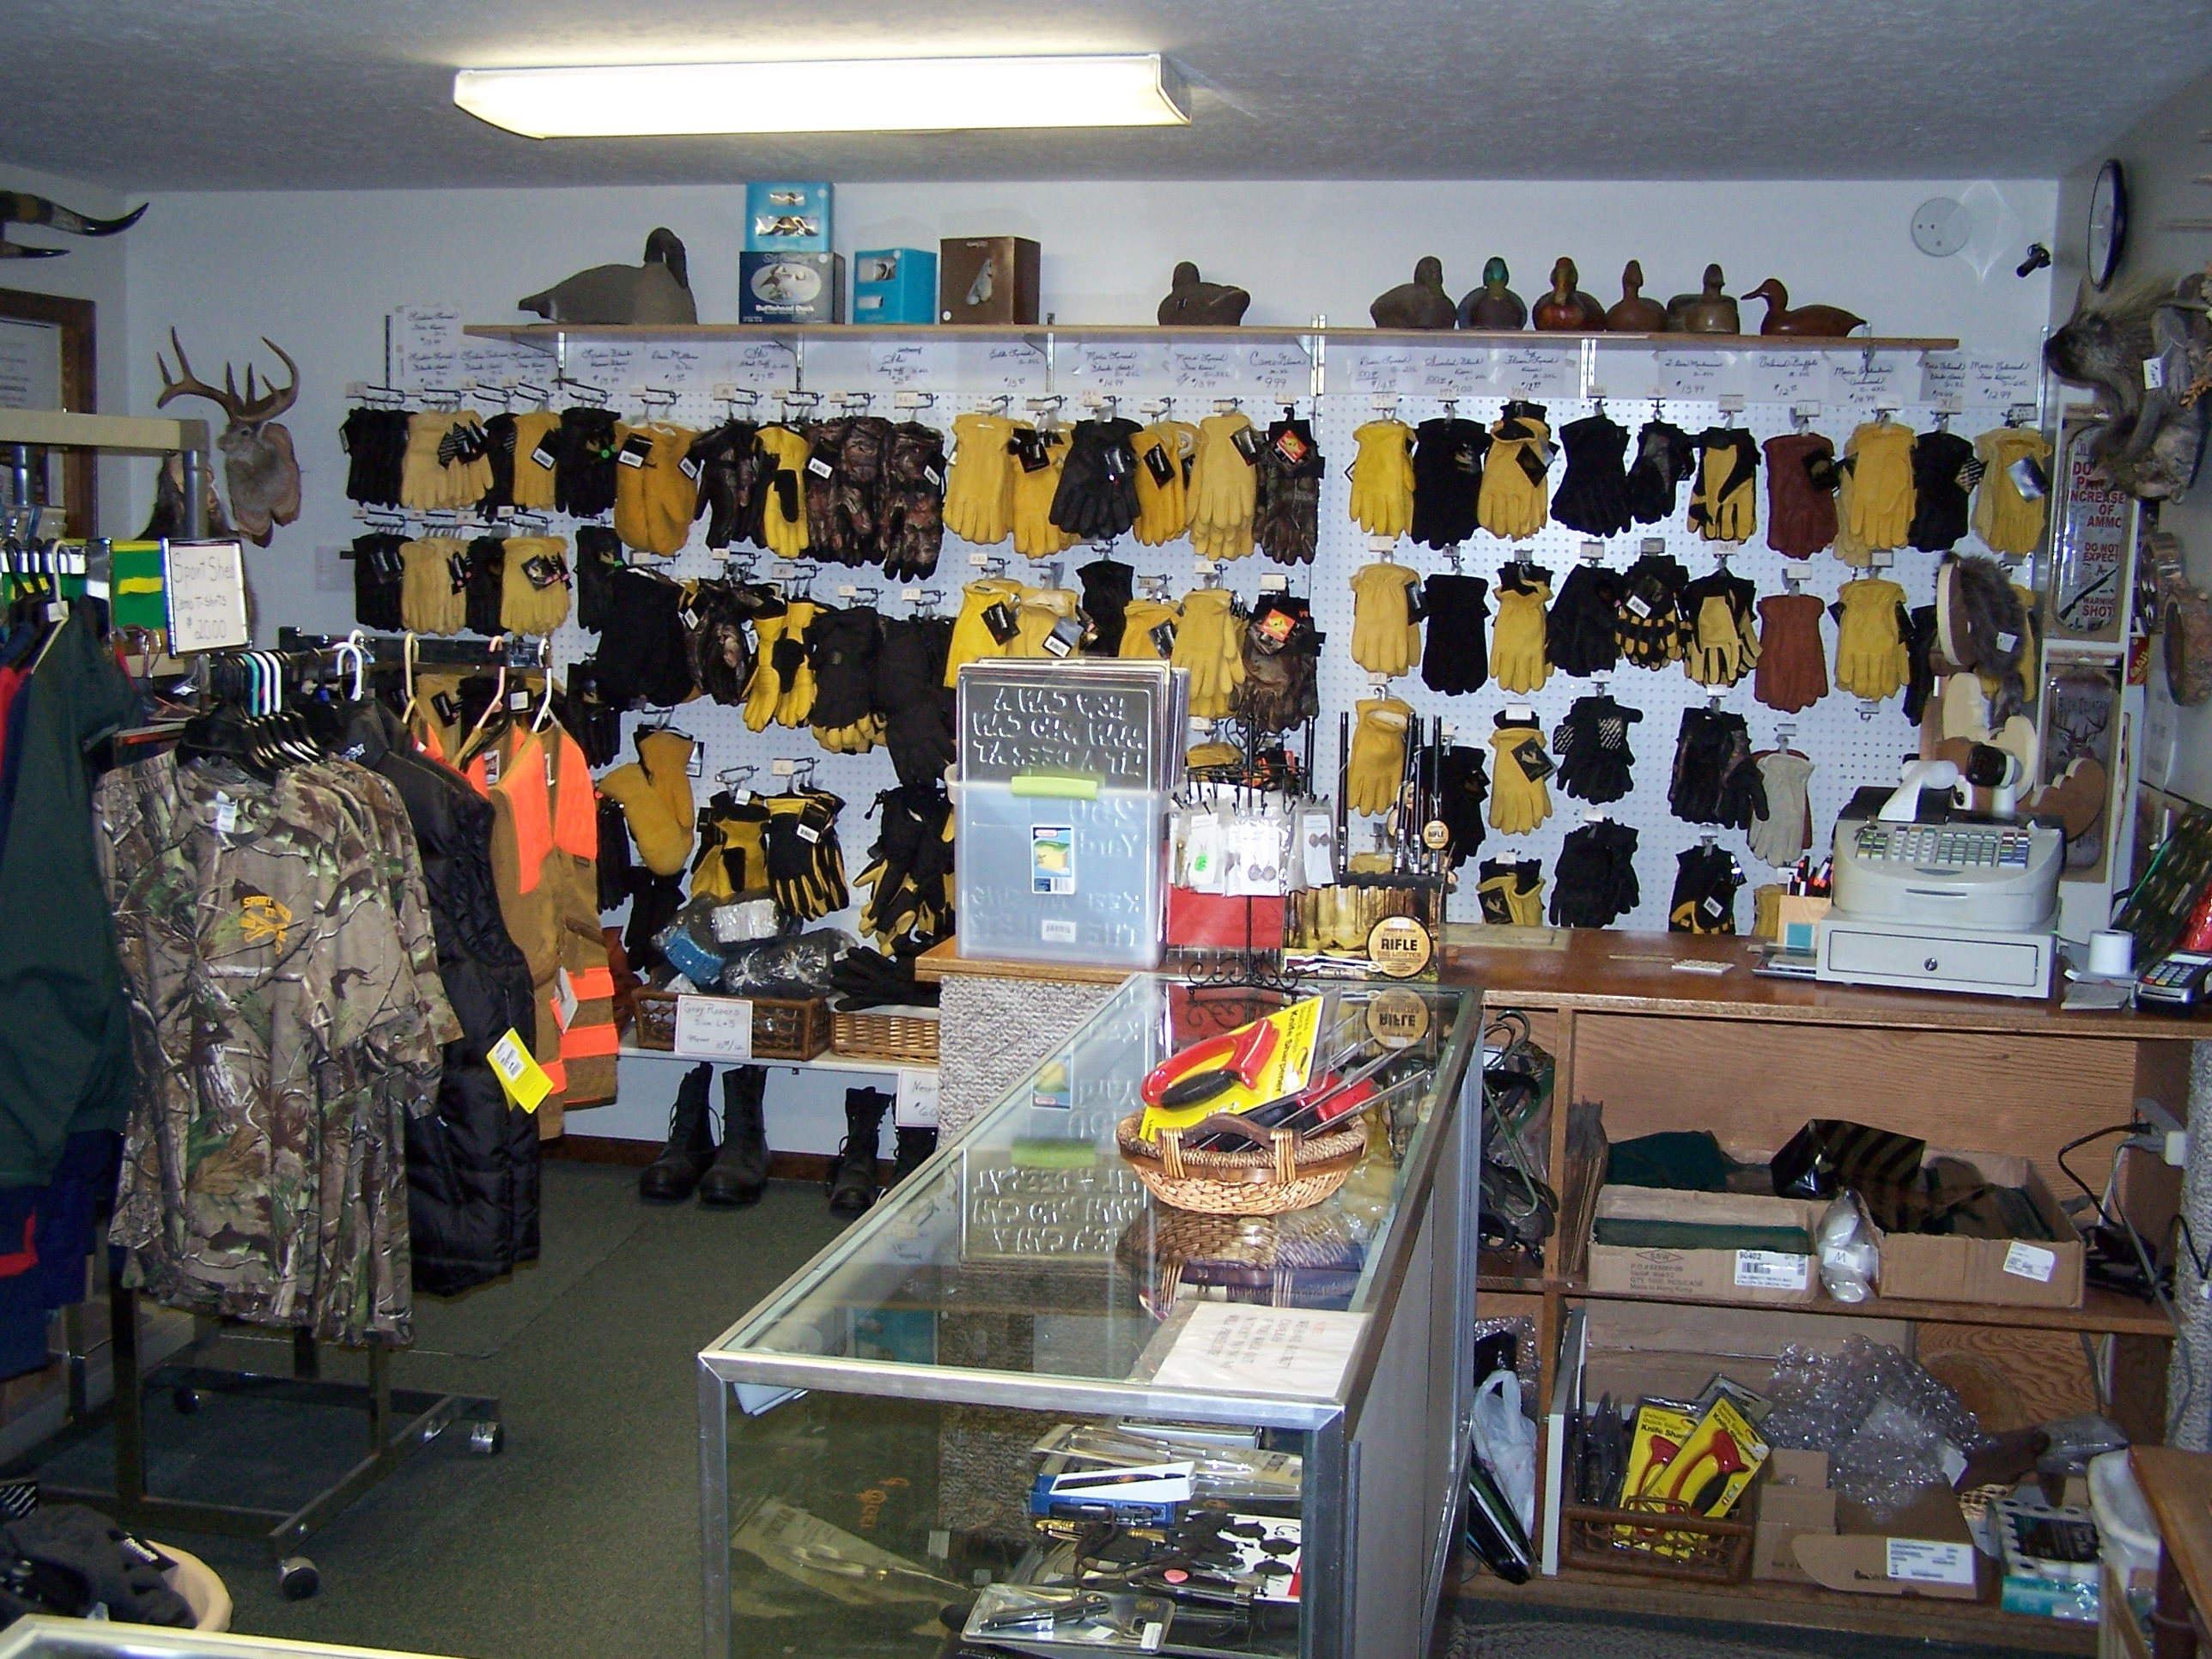 Husker Man Cave Ideas : Ord nebraska archive sports shed etc october